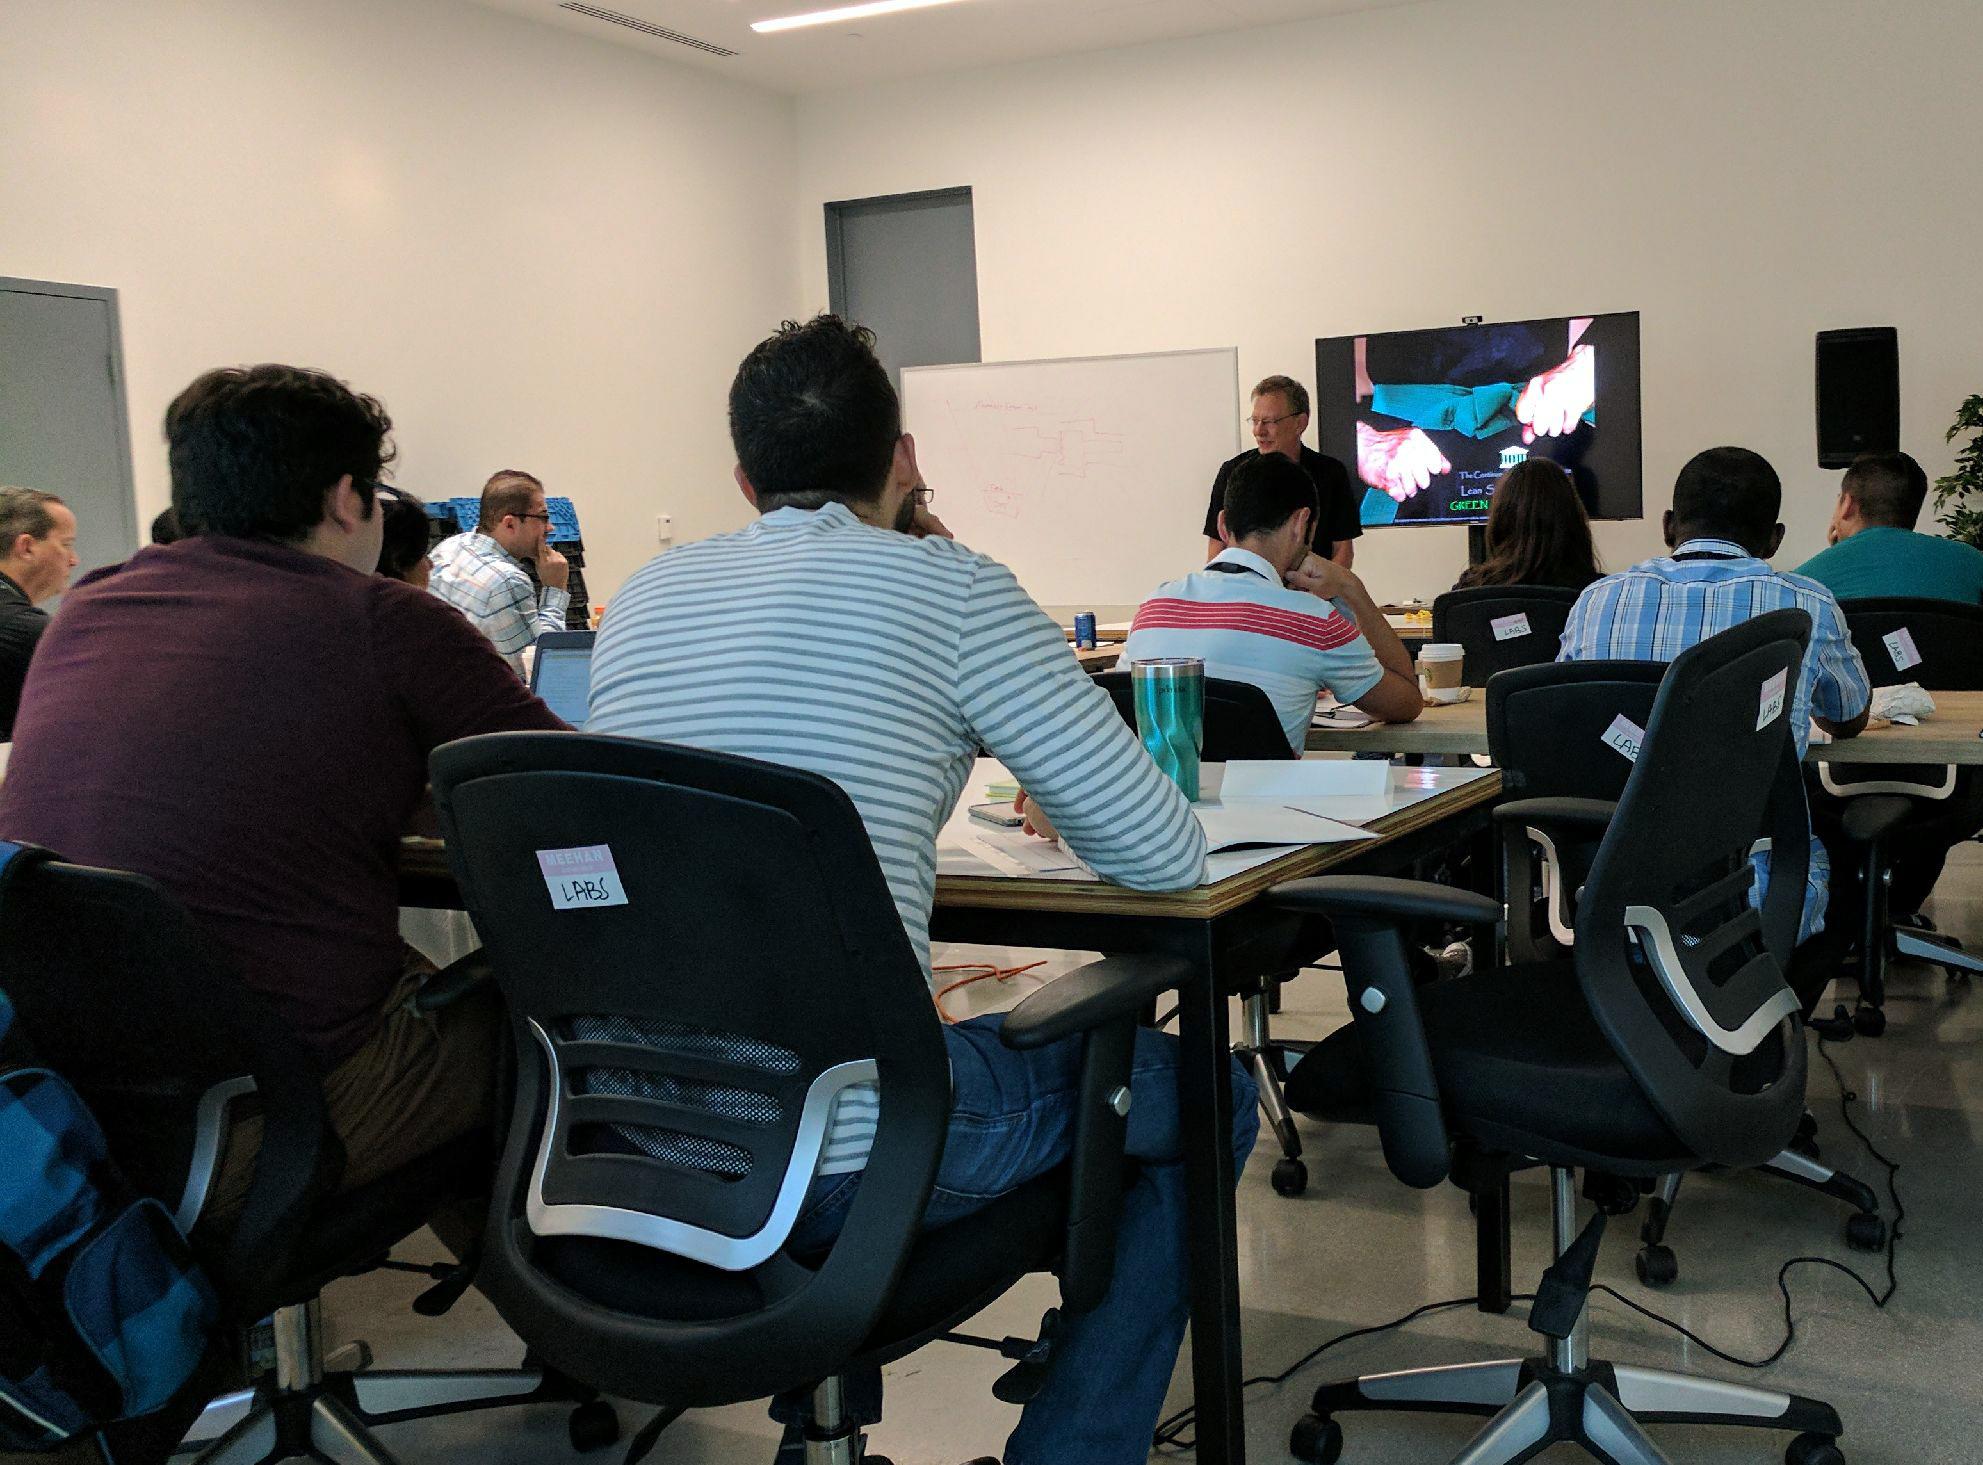 Cii_Training_Room.jpg